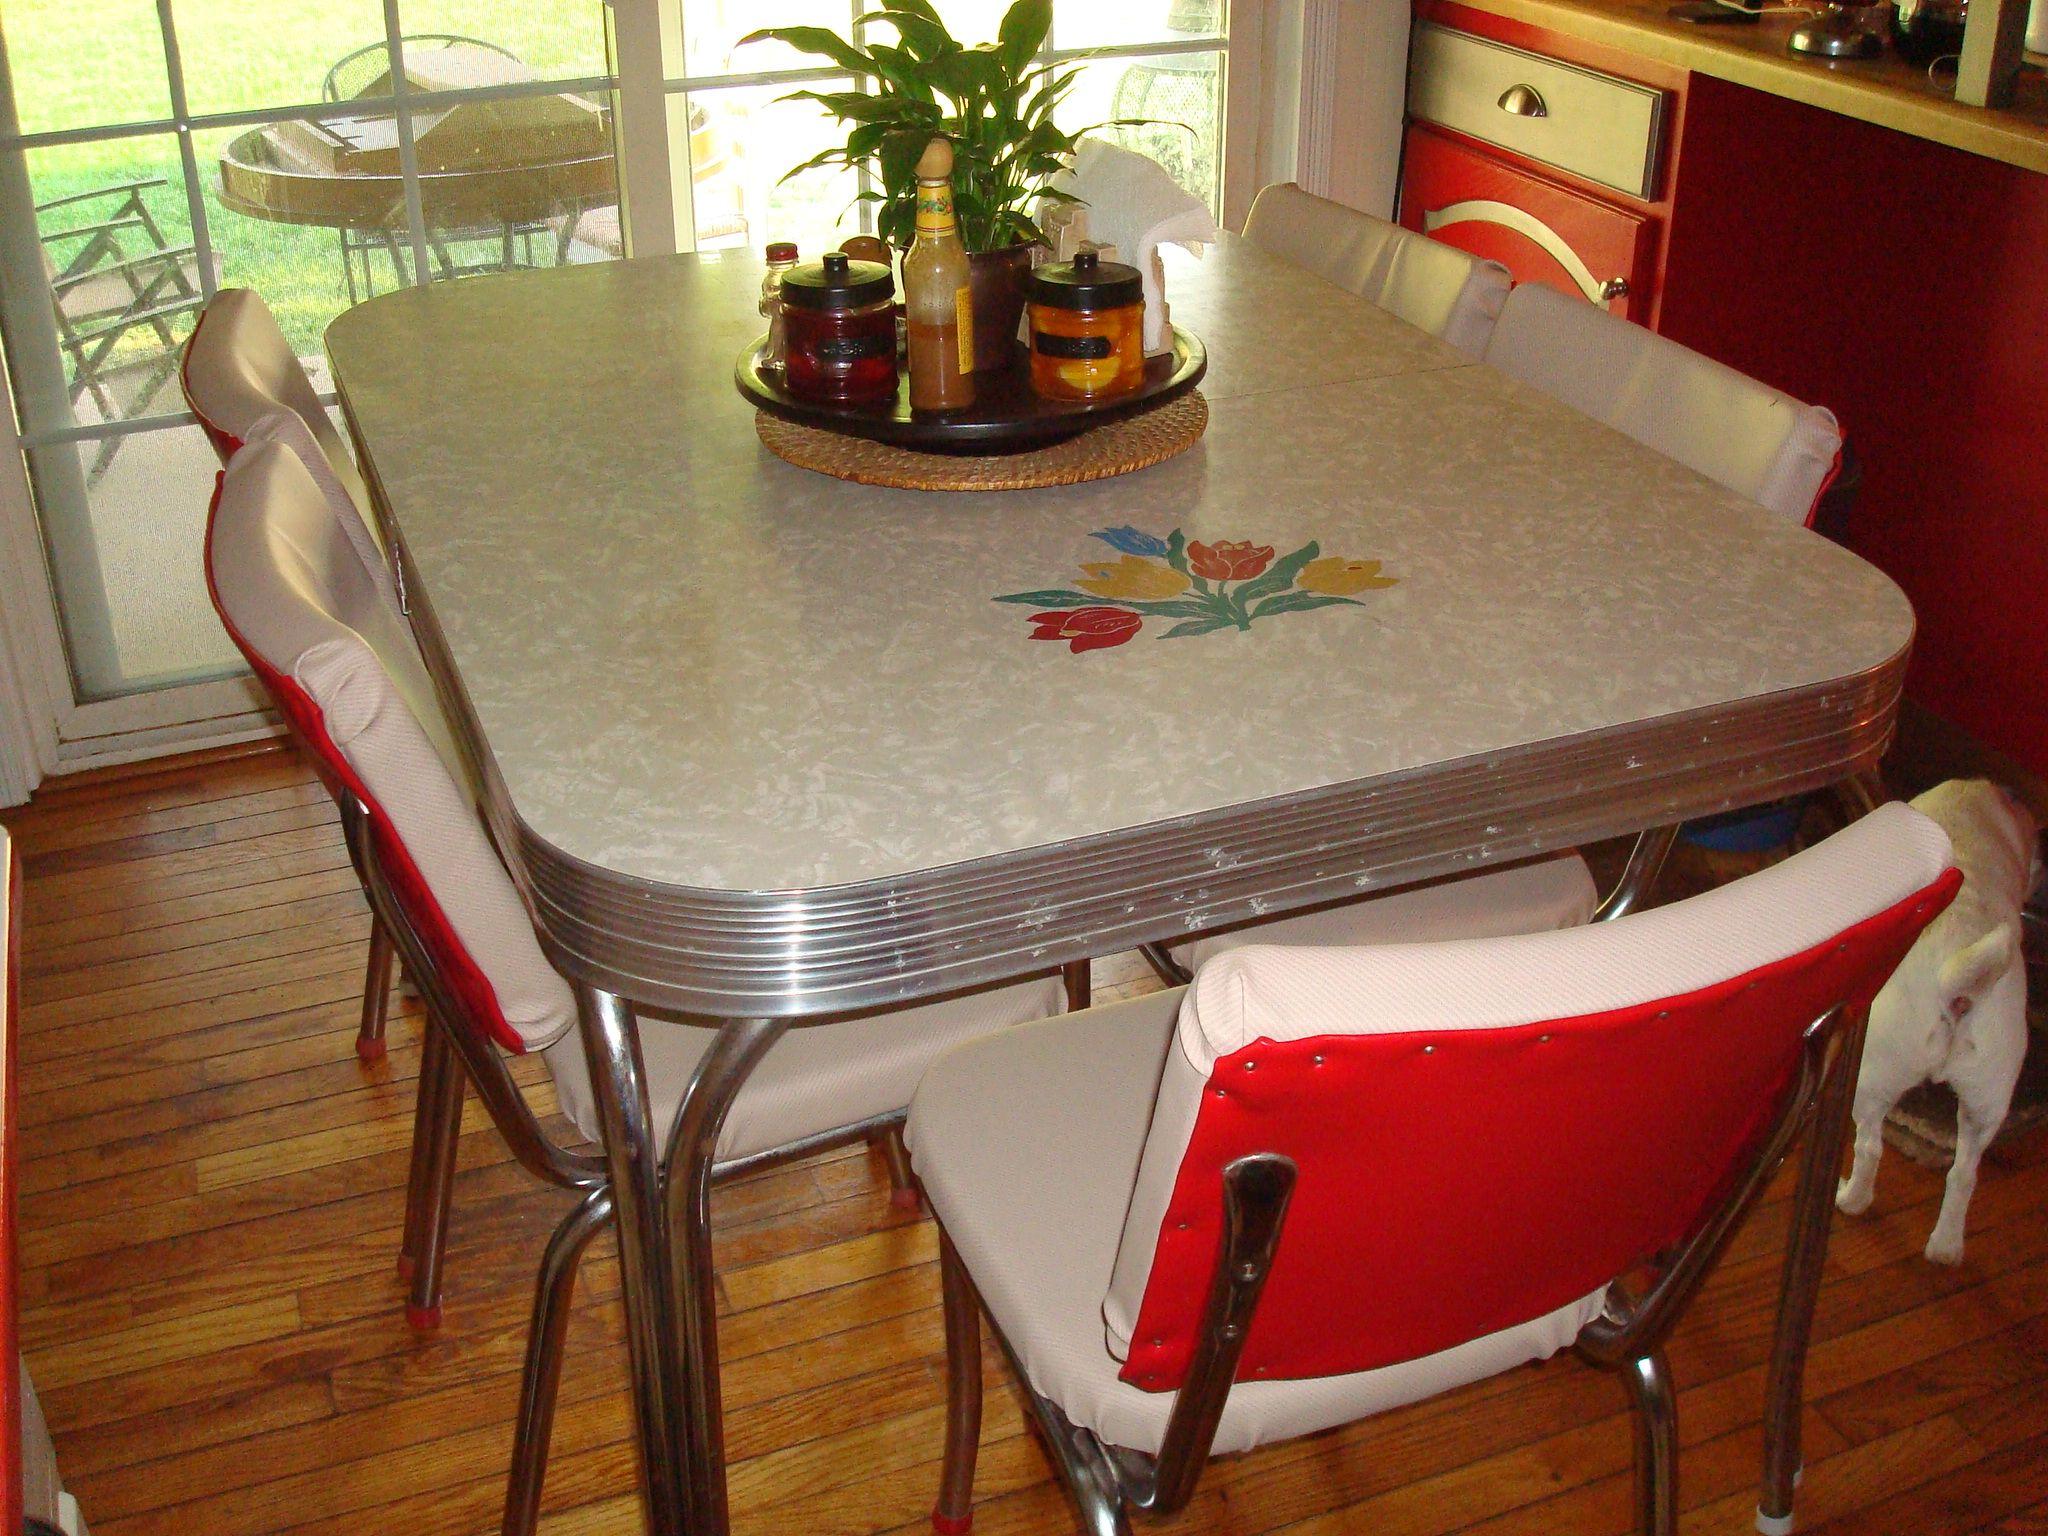 Vintage kitchen table formica - Retro Kitchen Table